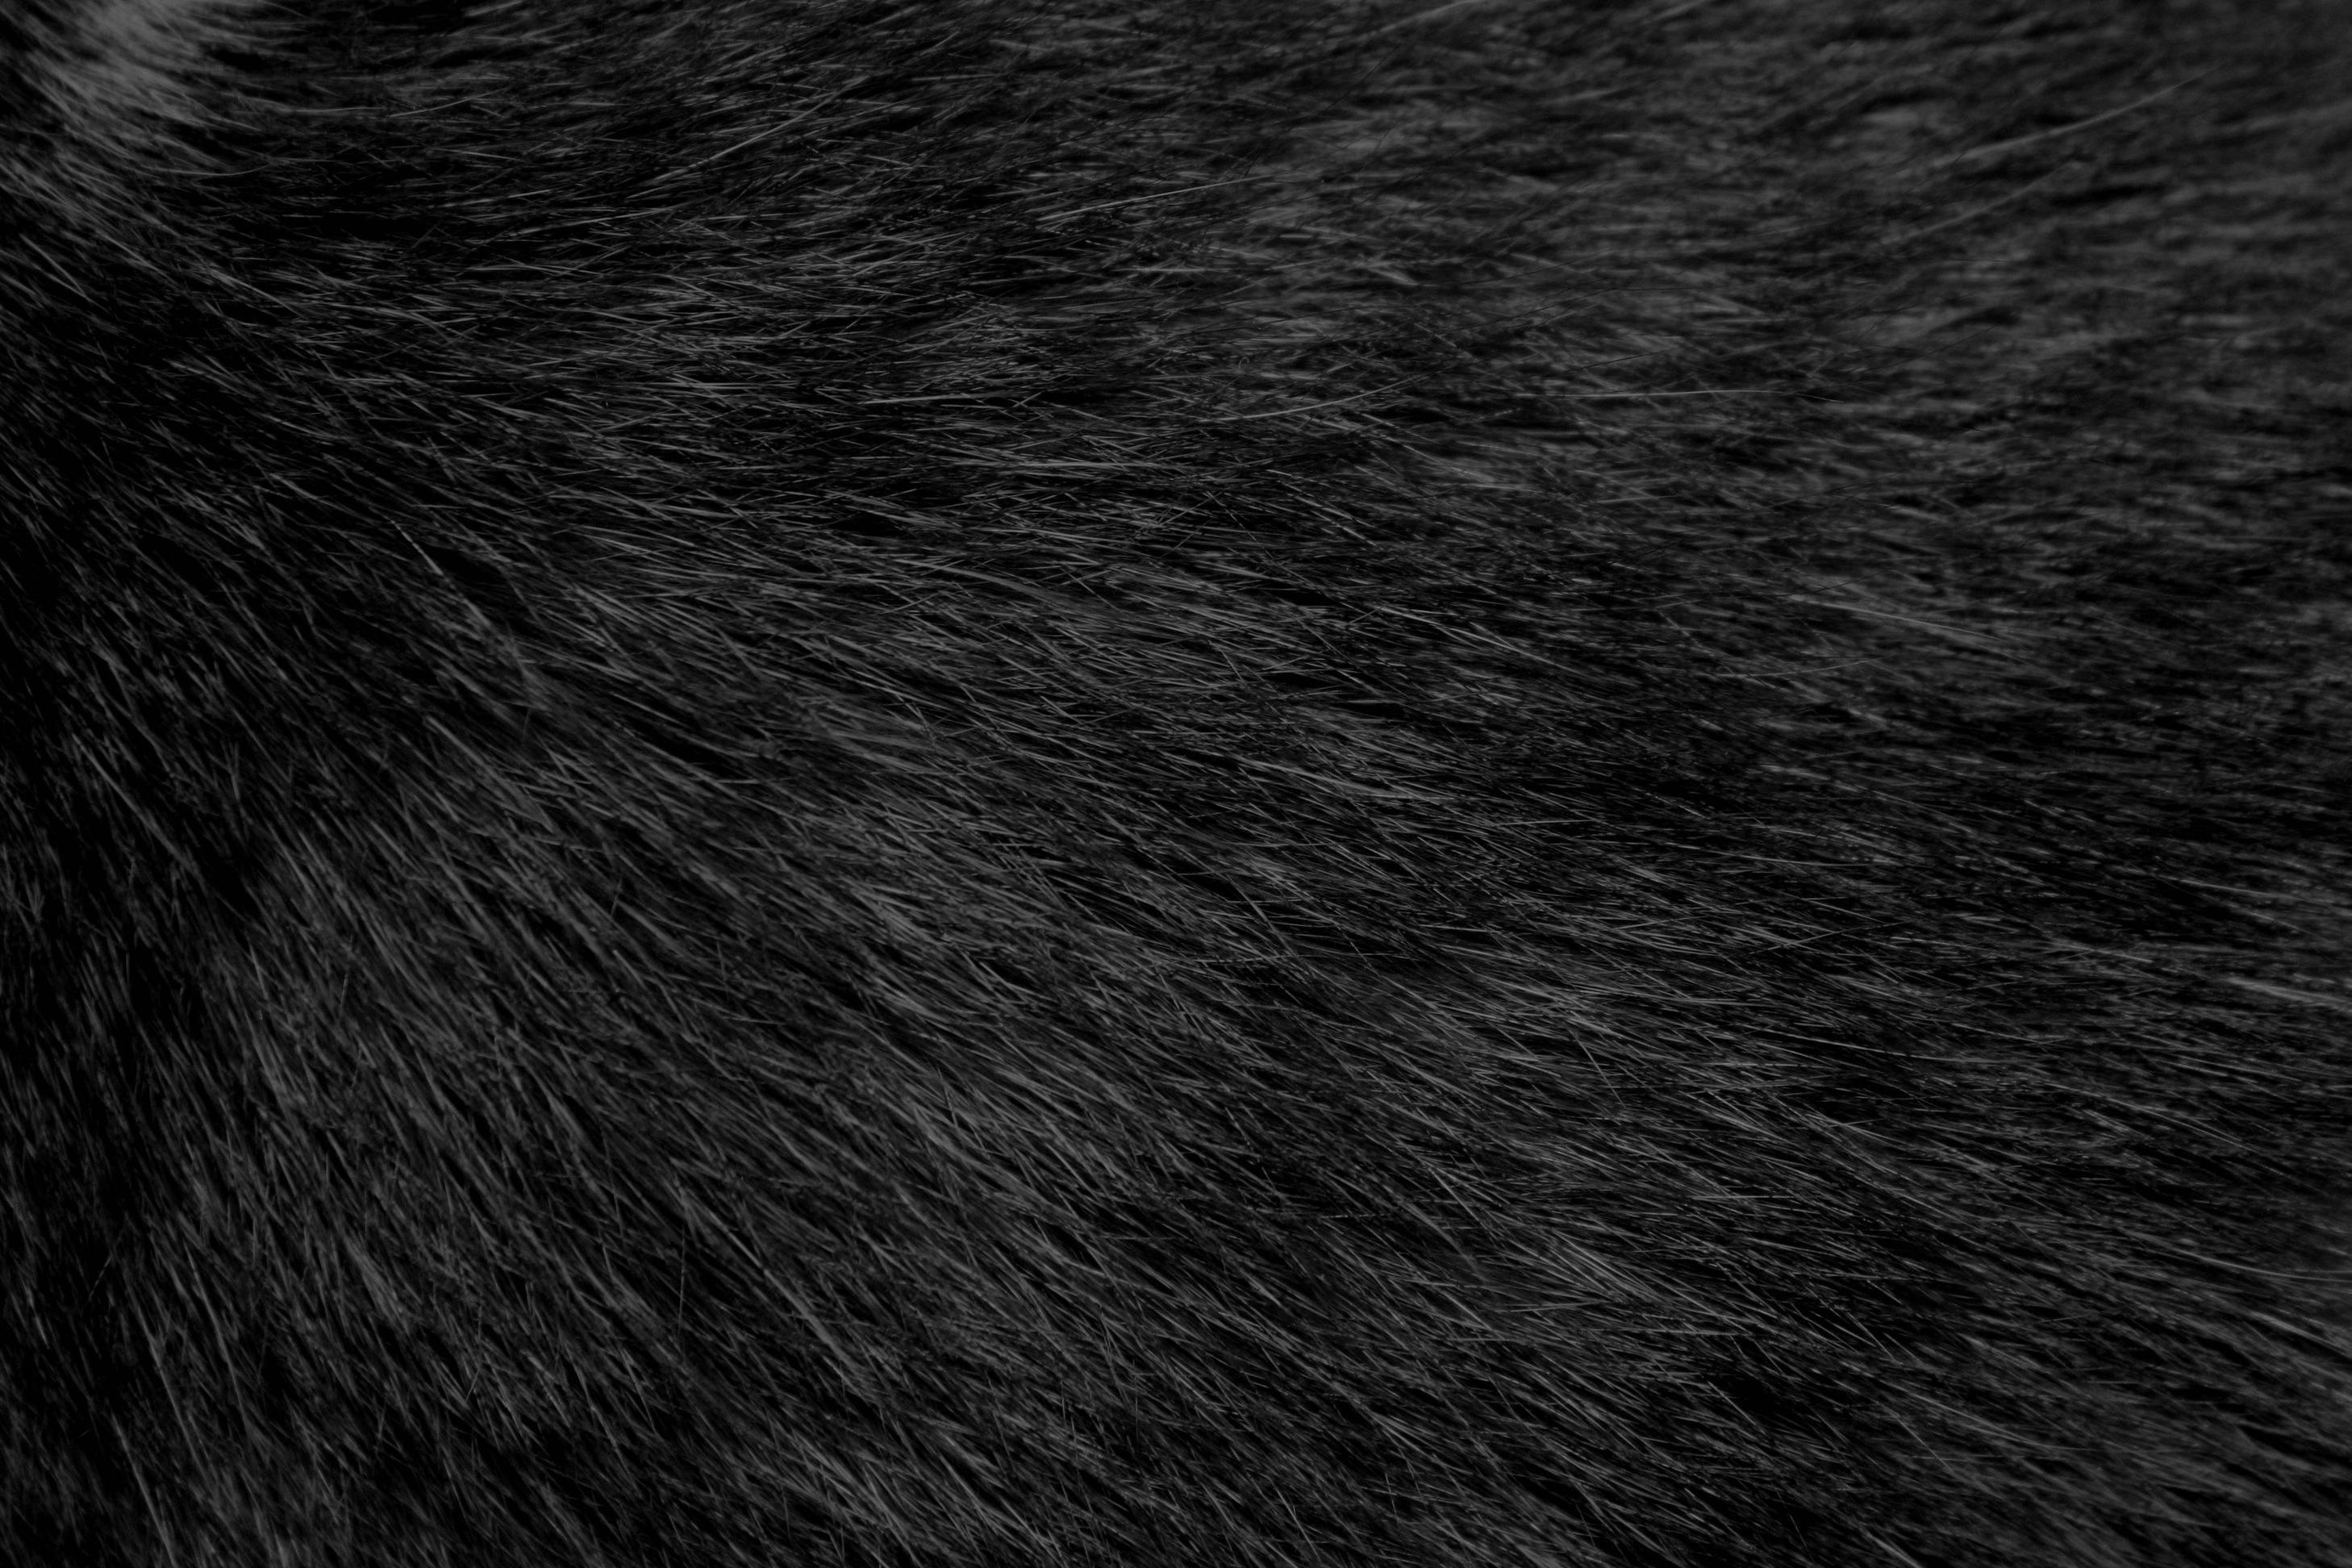 Pin by K P on texture | Pinterest | deviantART